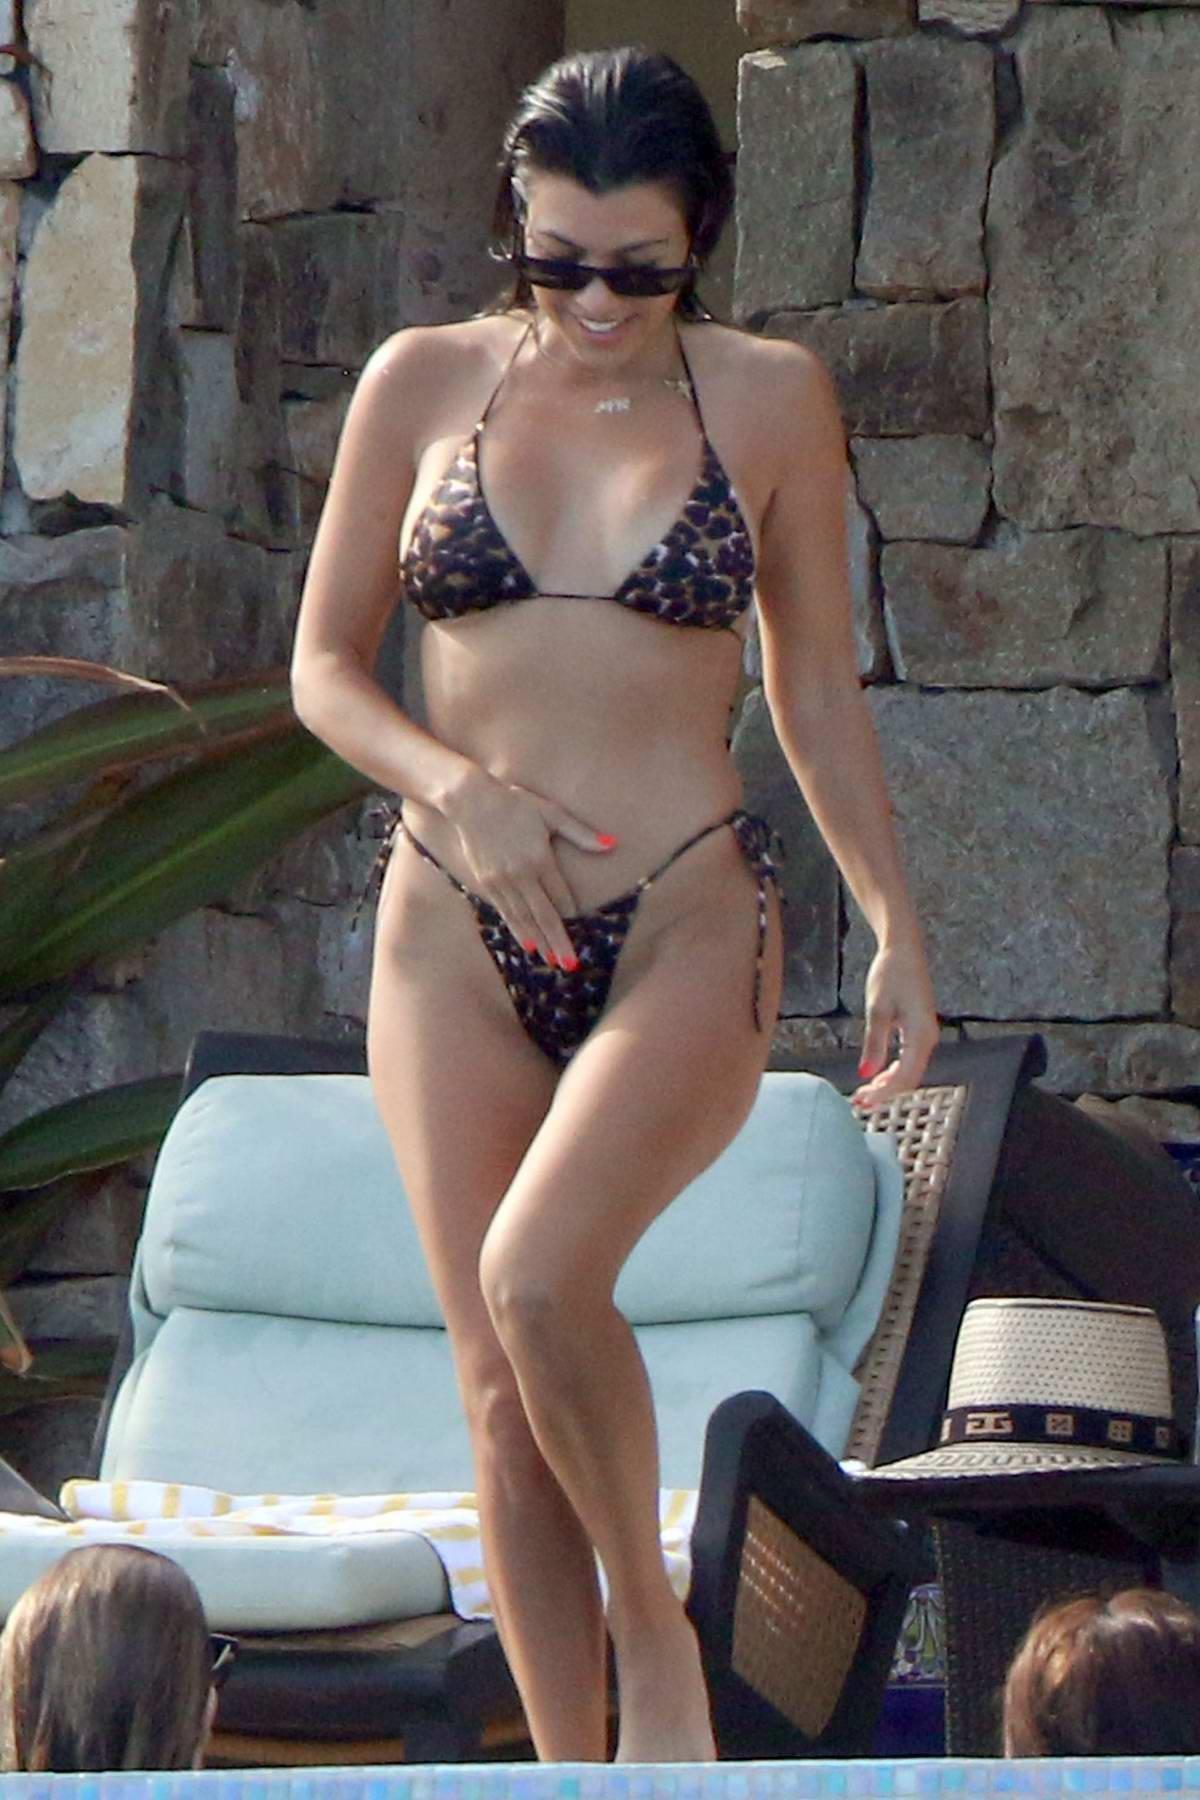 Kourtney Kardashian wears a leopard print bikini while she relax by the pool in Cabo, Mexico